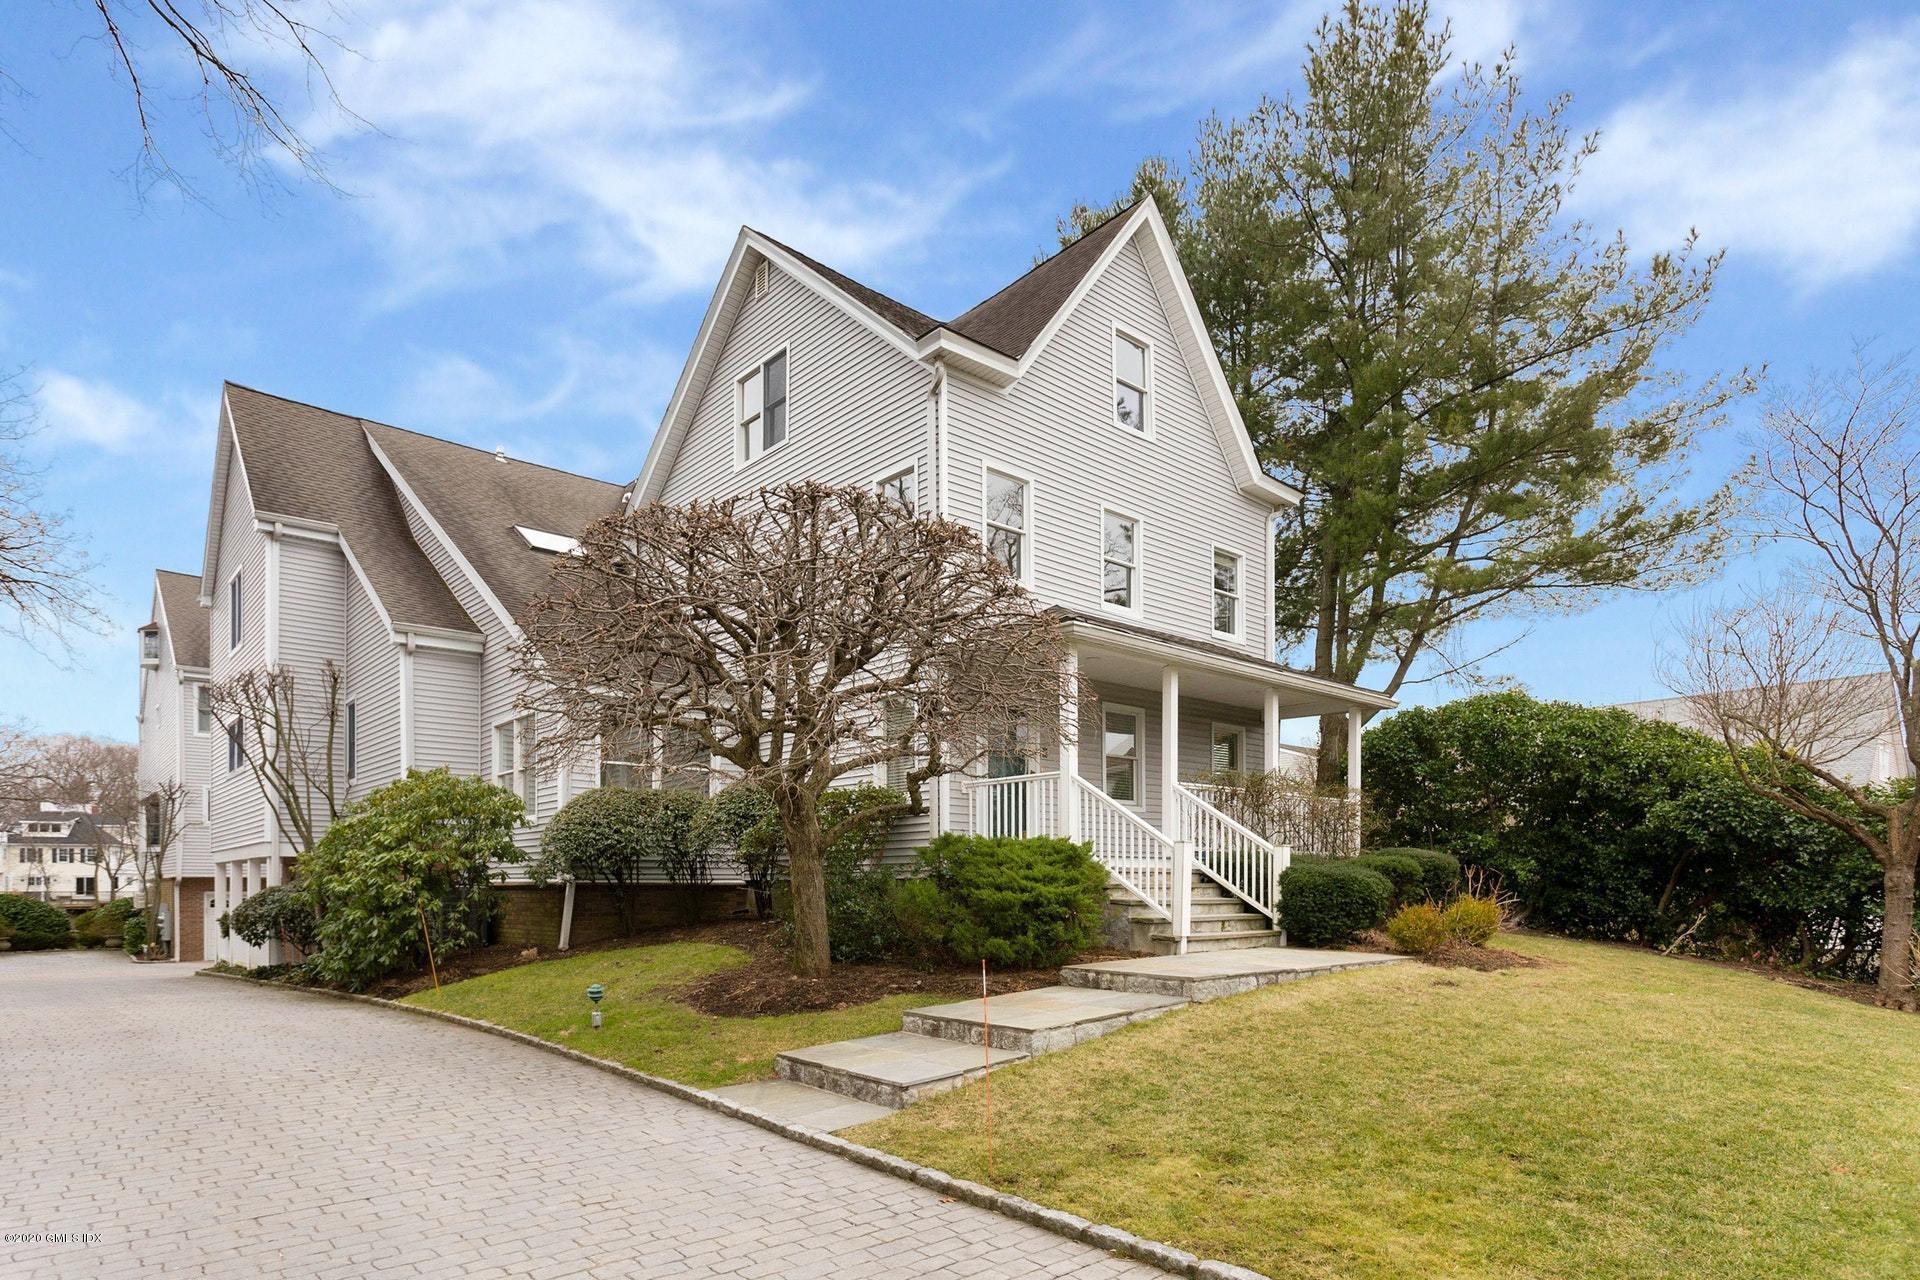 37 Davenport Avenue,Greenwich,Connecticut 06830,3 Bedrooms Bedrooms,3 BathroomsBathrooms,Condominium,Davenport,108619